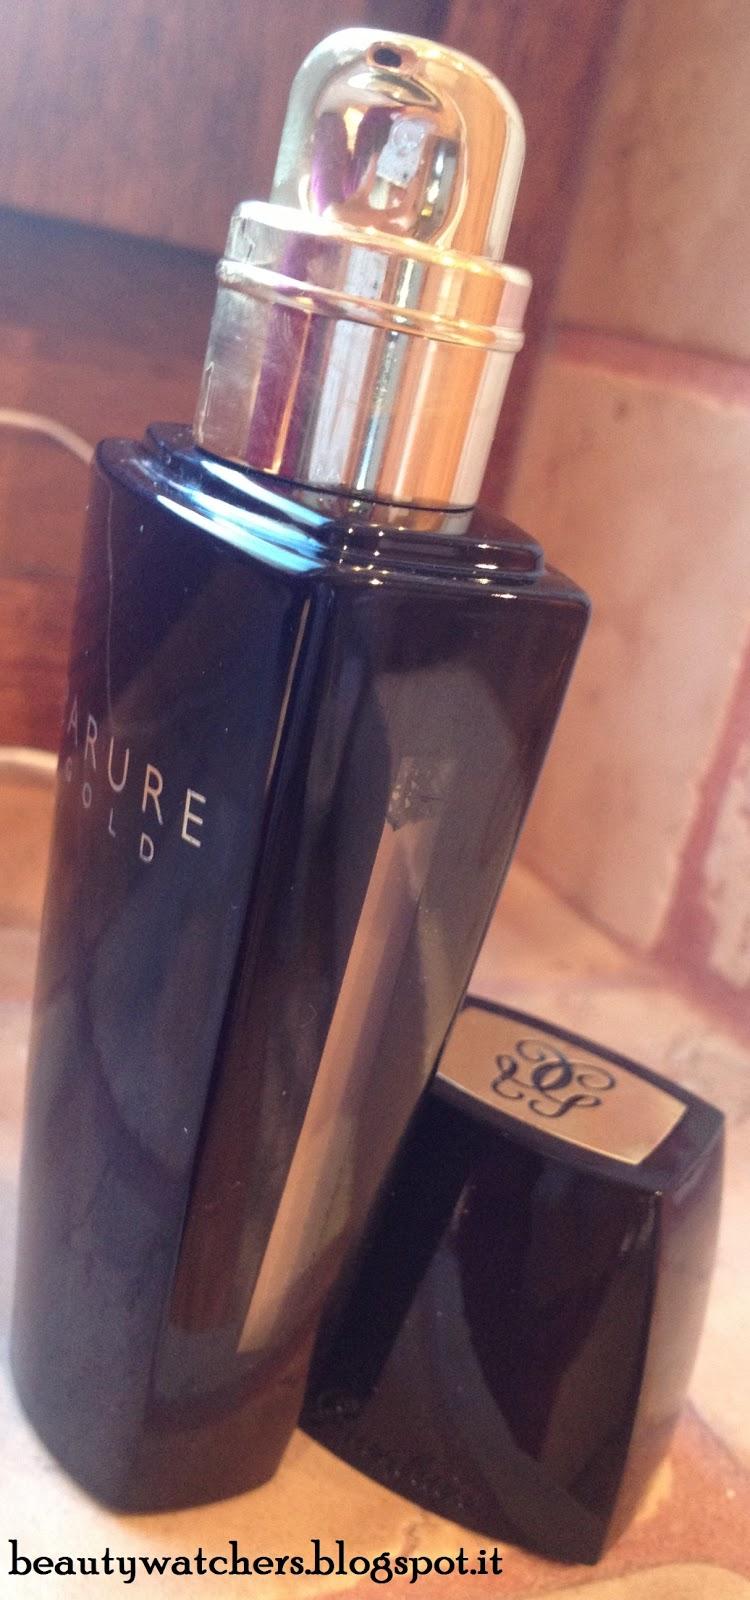 nuova selezione l'ultimo migliore qualità per beautywatchers: Guerlain - Parure Gold Fond de Teint Lumière ...